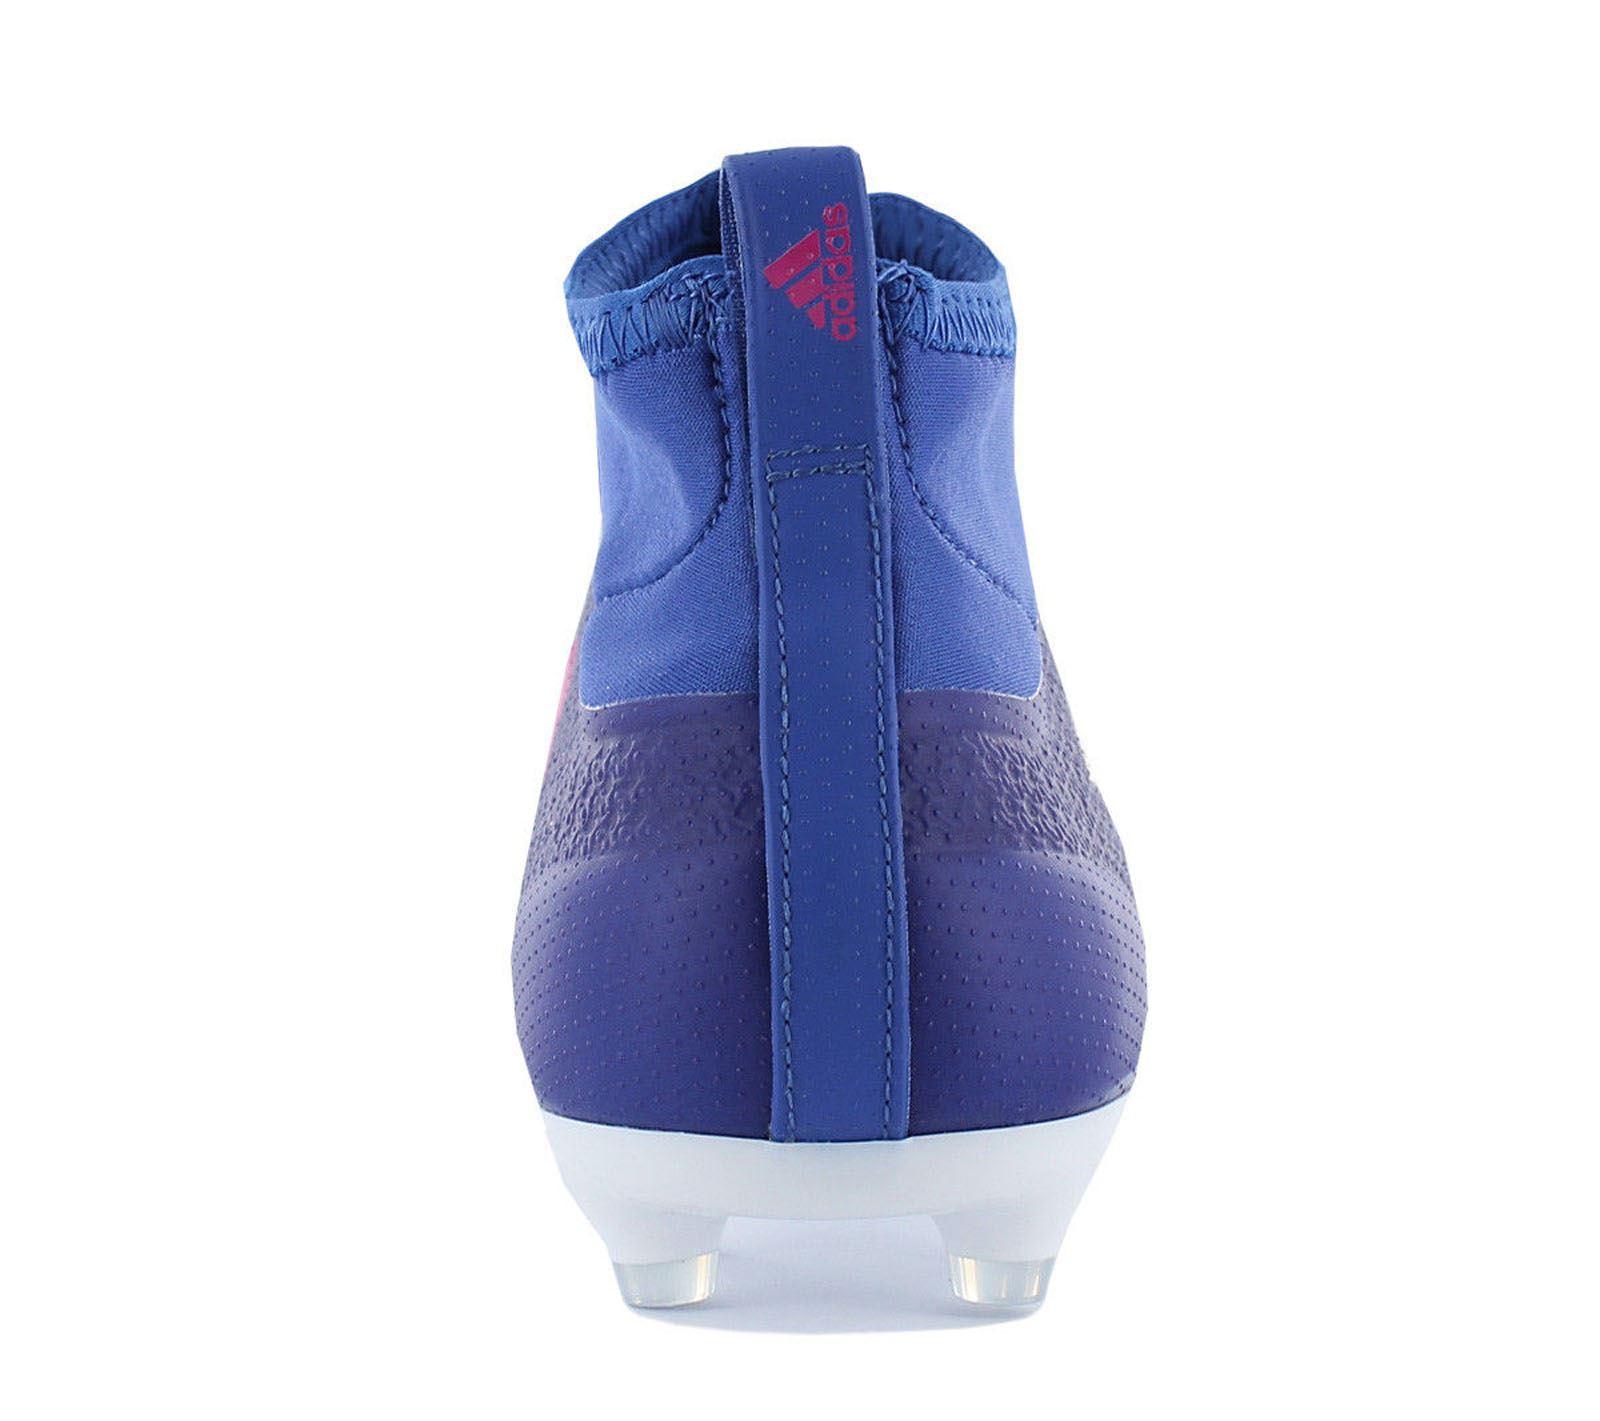 adidas-Ace-17-2-Primemesh-Mens-FG-Football-Boots-Soccer-RRP-100-SAVE-039-S thumbnail 15